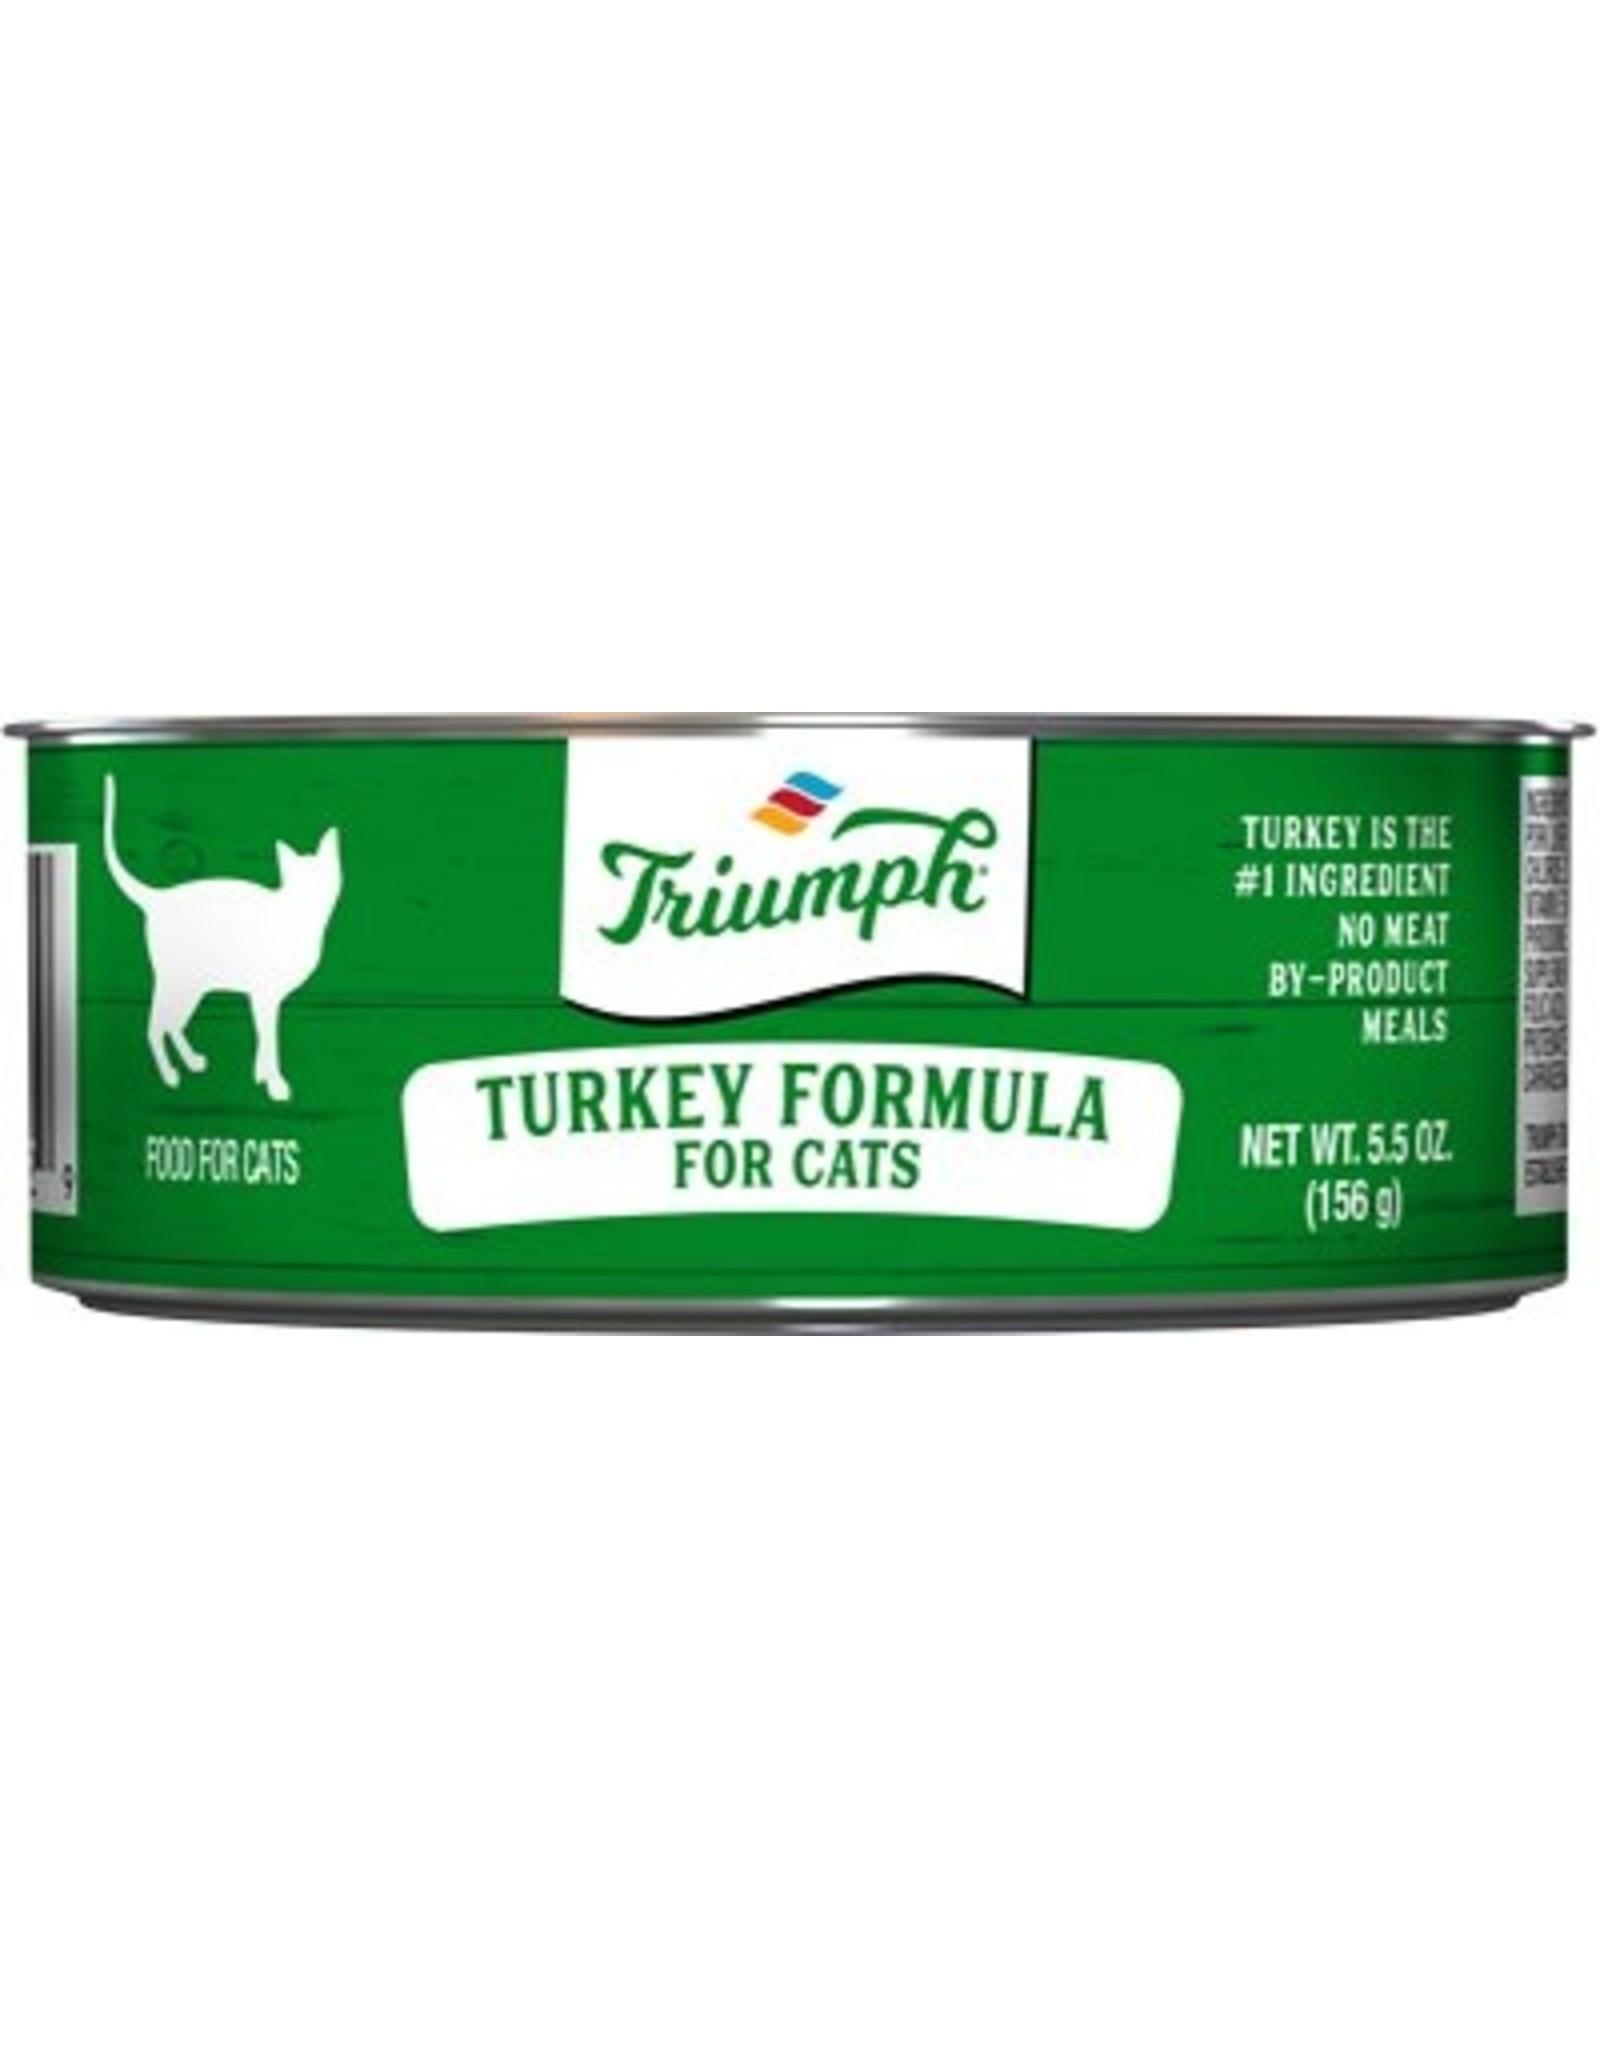 Triumph Triumph Wet Cat Food Turkey Formula 5.5oz Can